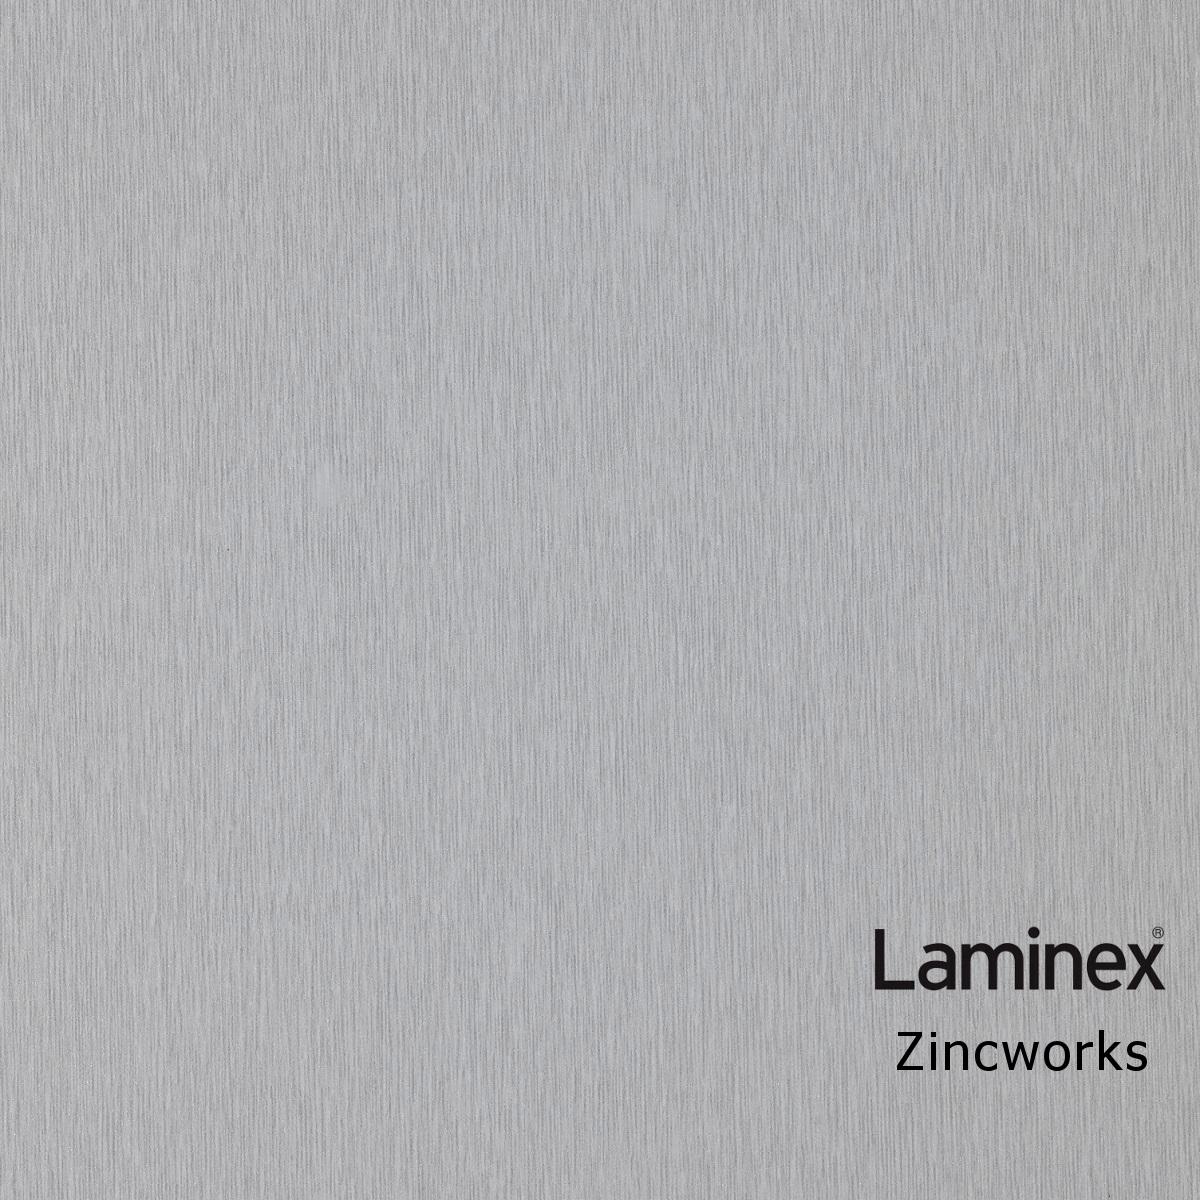 Zincworks resco for Zinc laminate